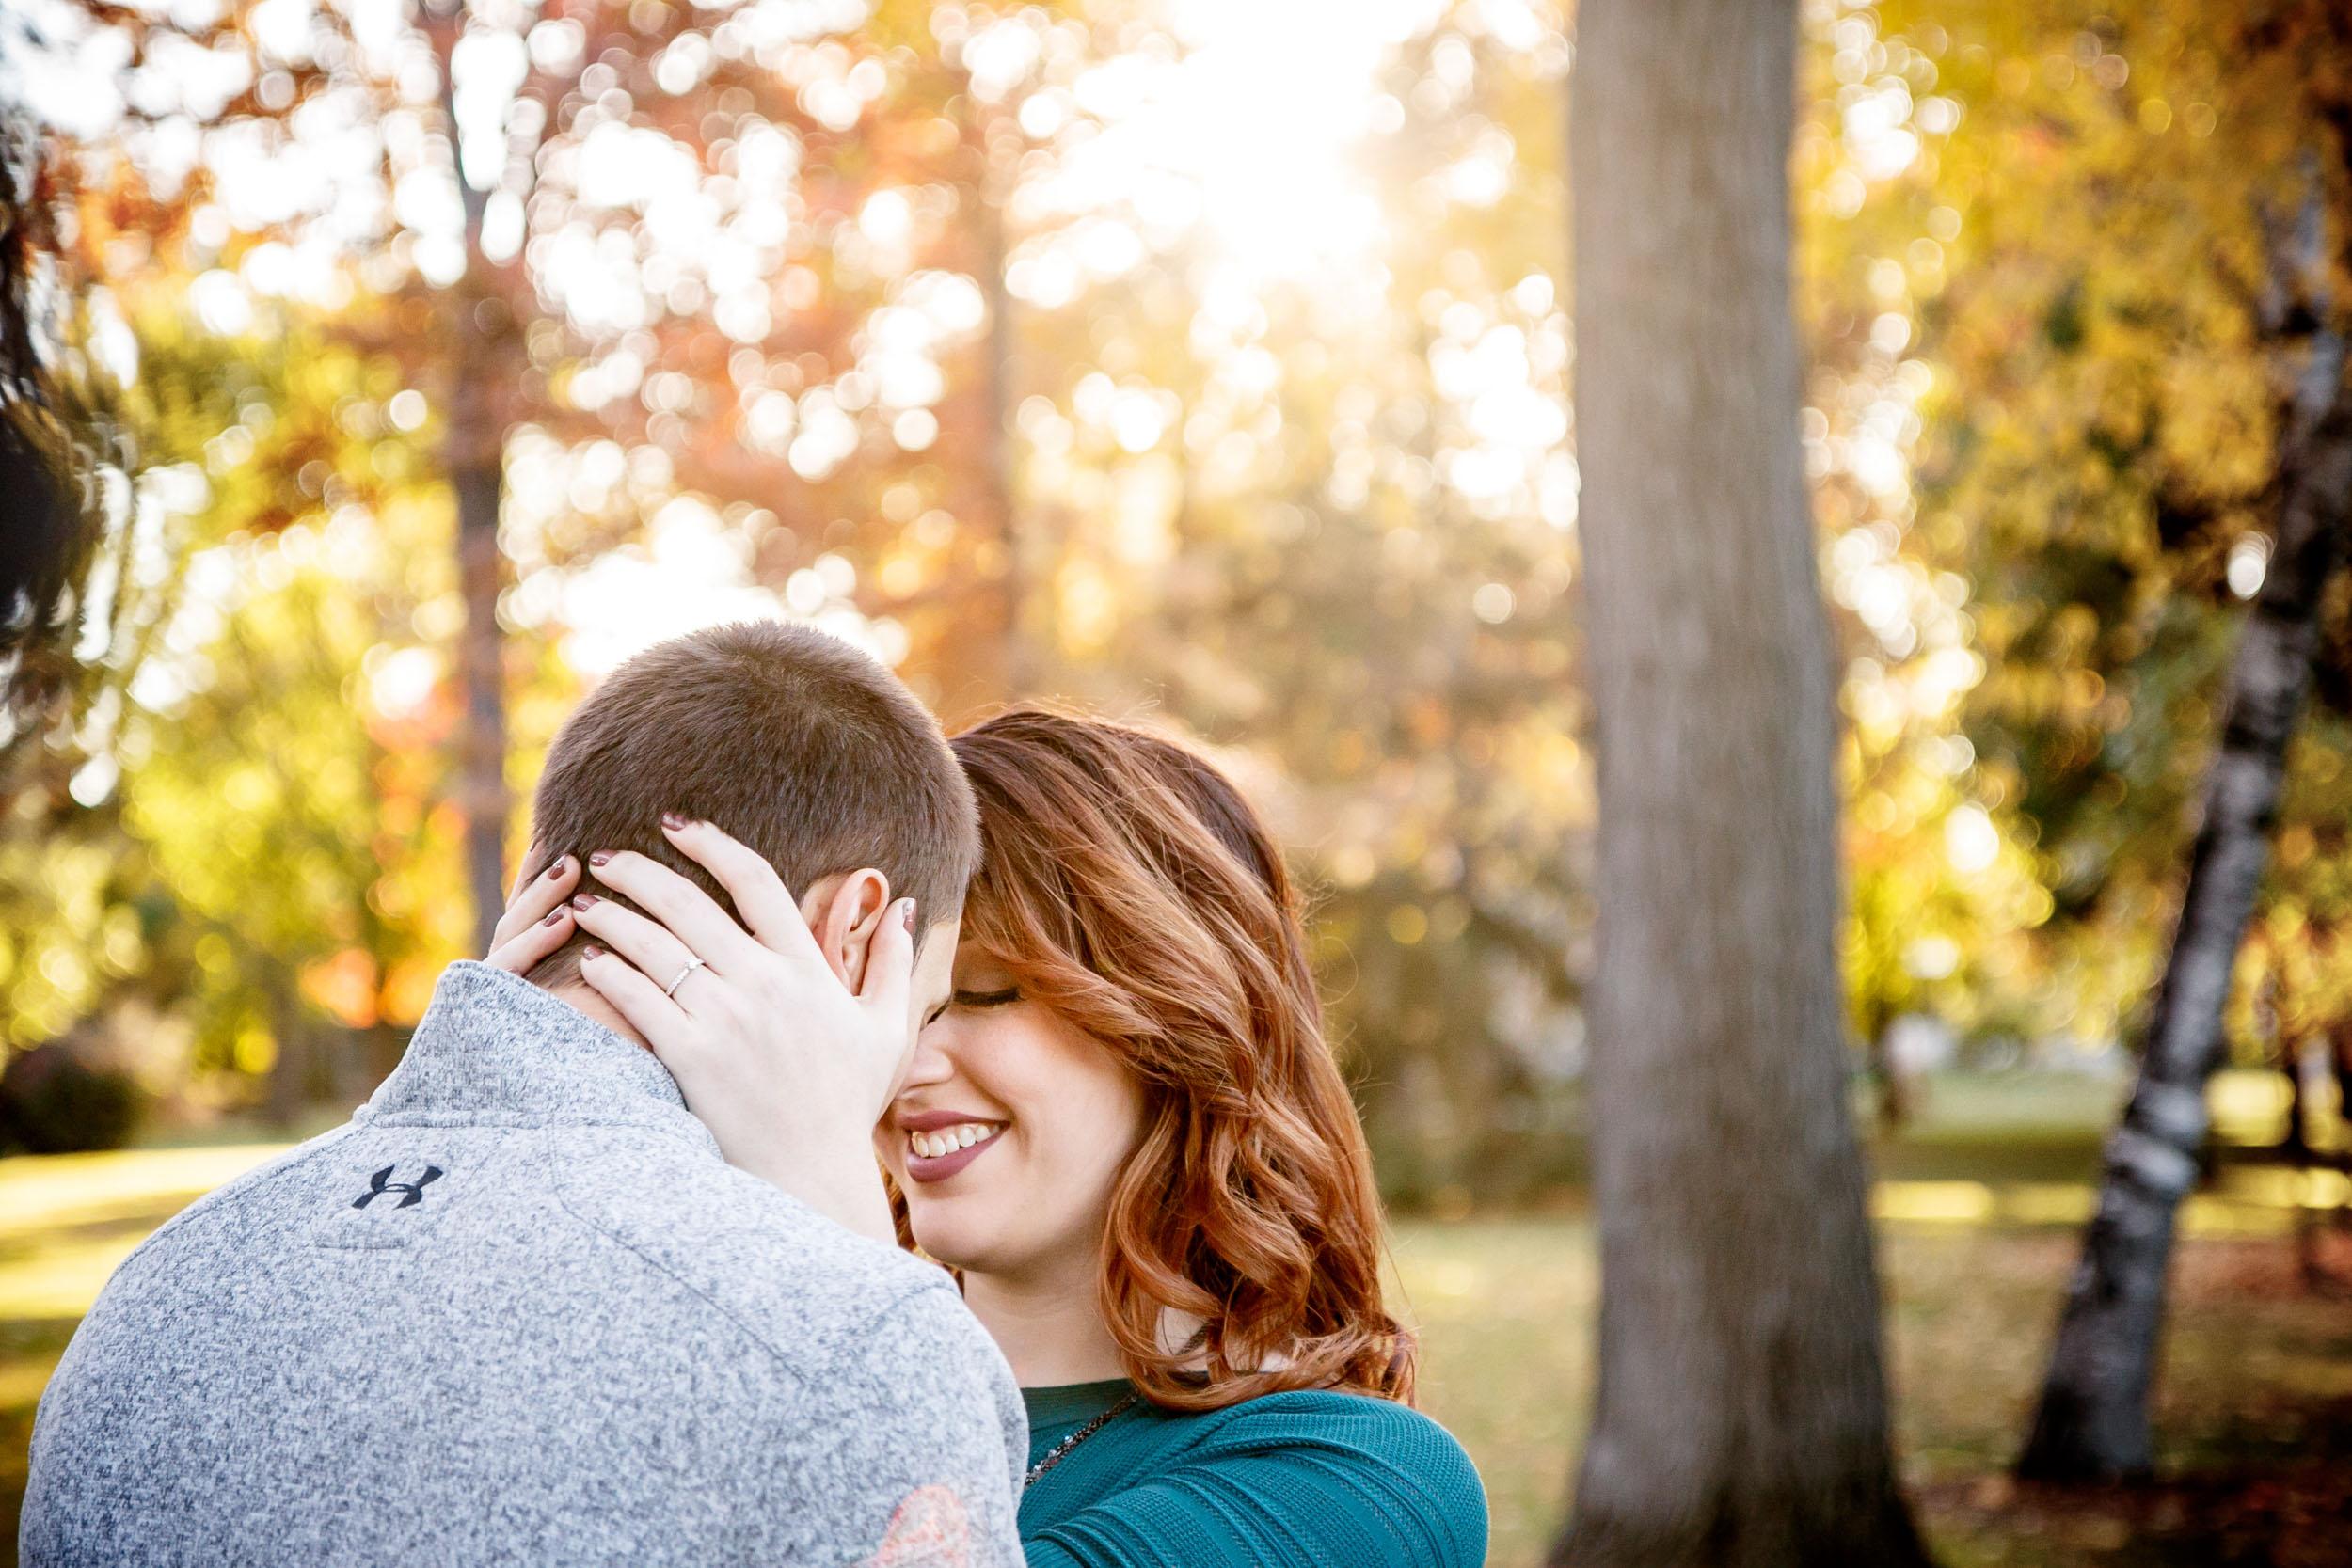 fall-engagement-photos-riverside-park-neenah-wisconsin--adam-shea-photography-green-bay-appleton-neenah-photographer-25.jpg